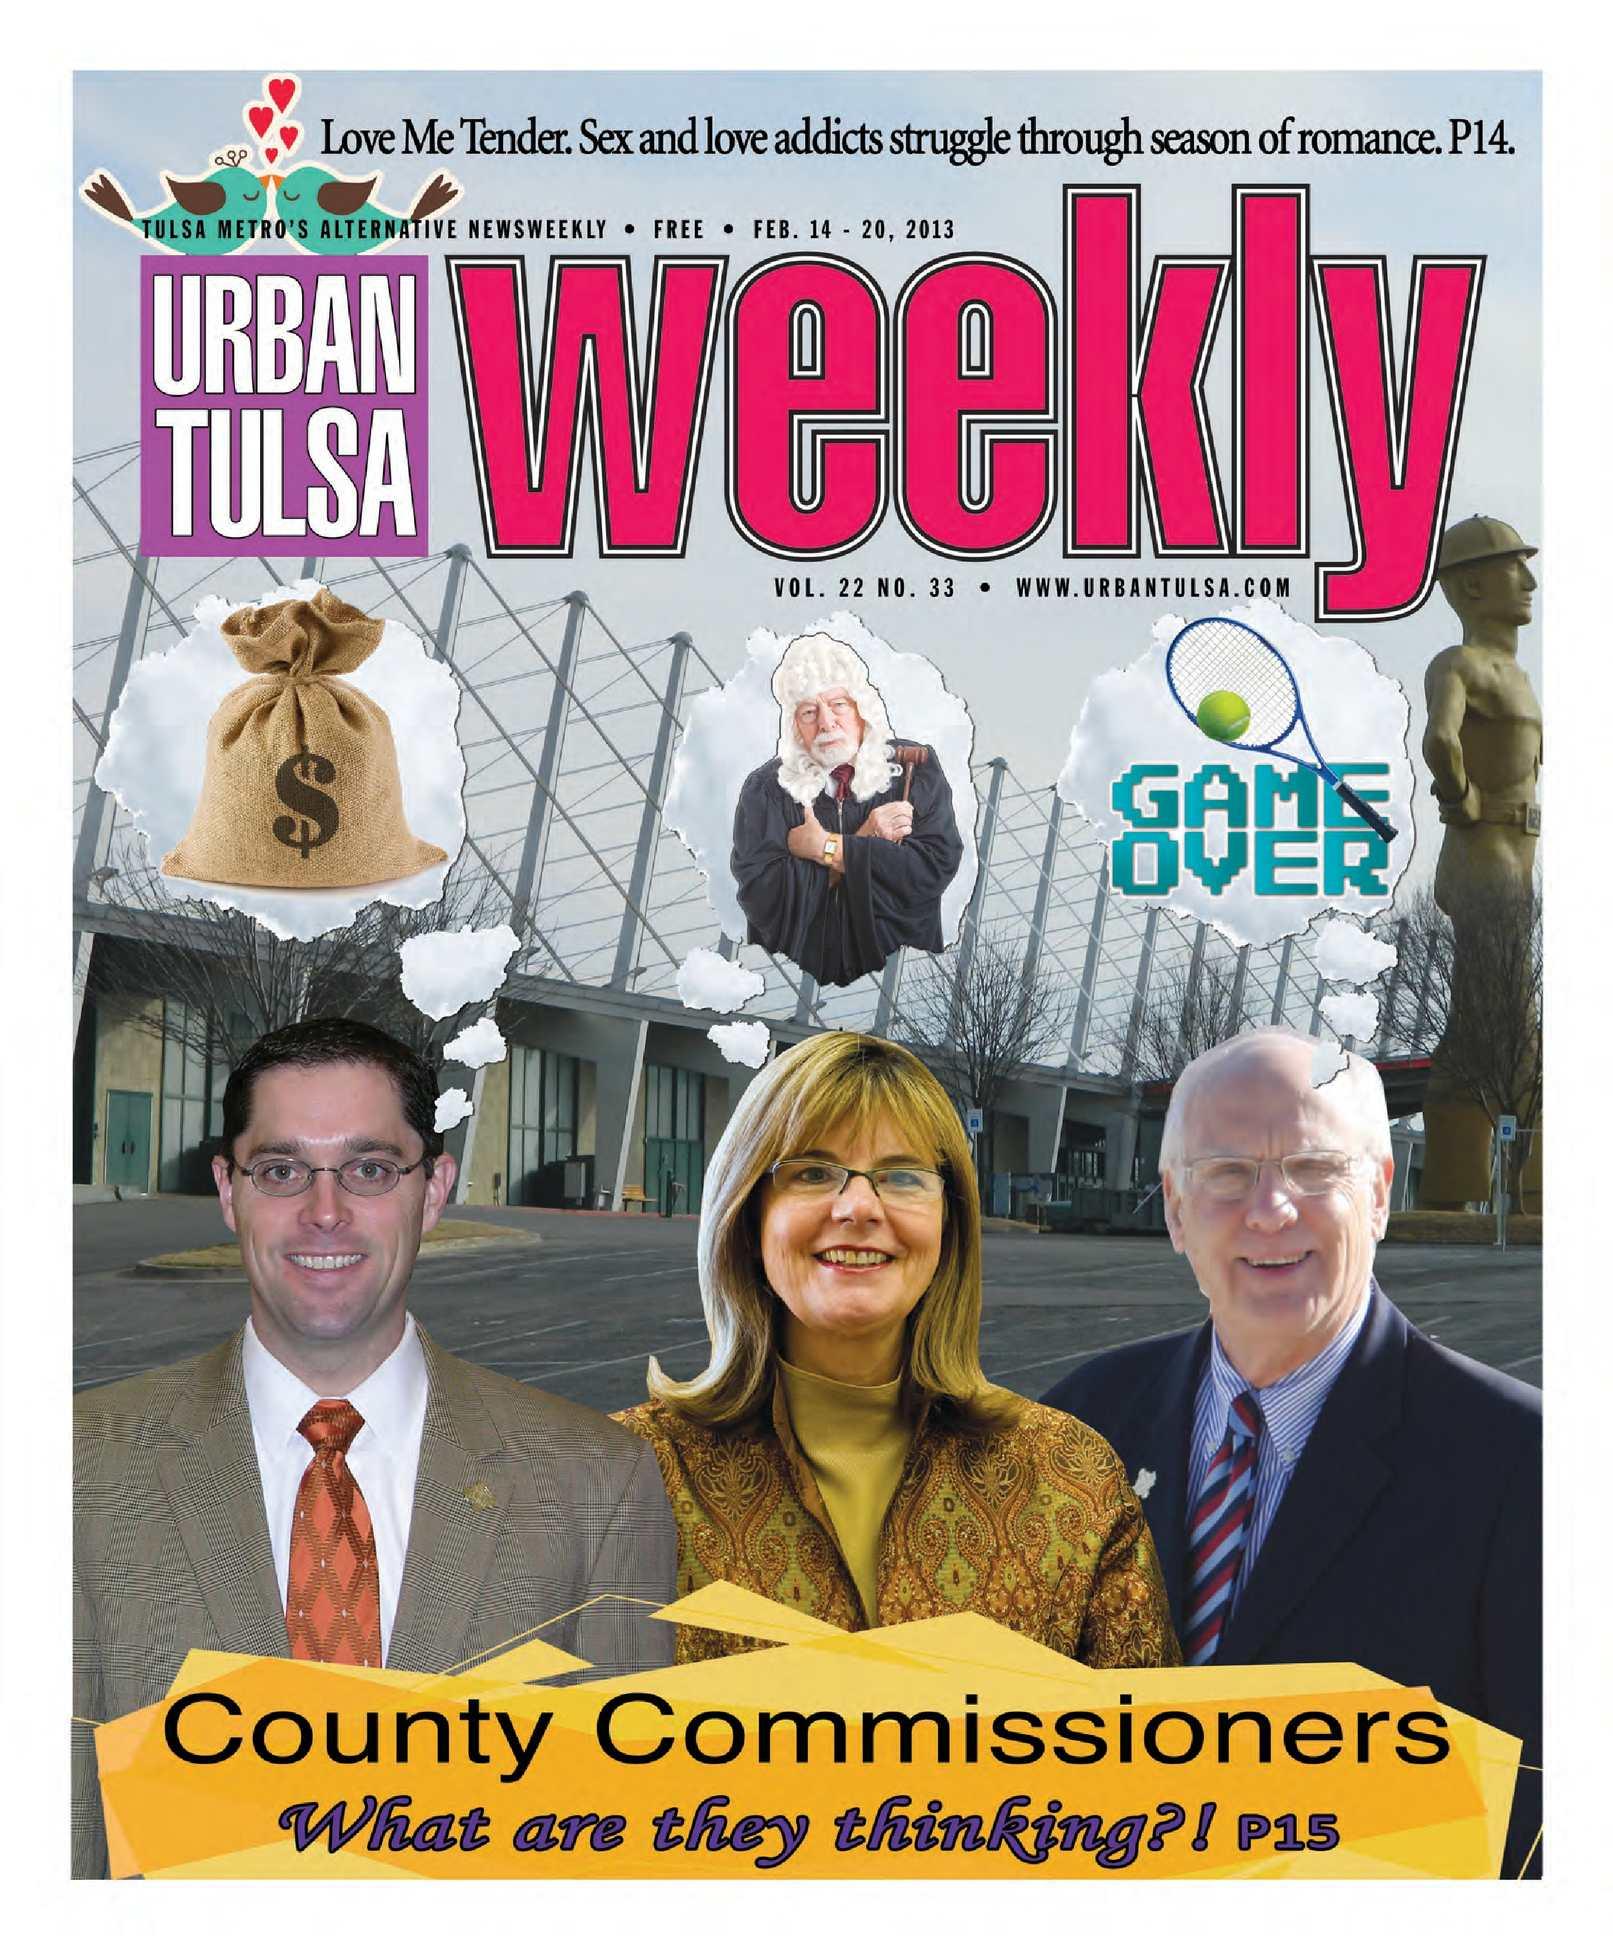 Calamo Urban Tulsa Weekly February 14 20 2013